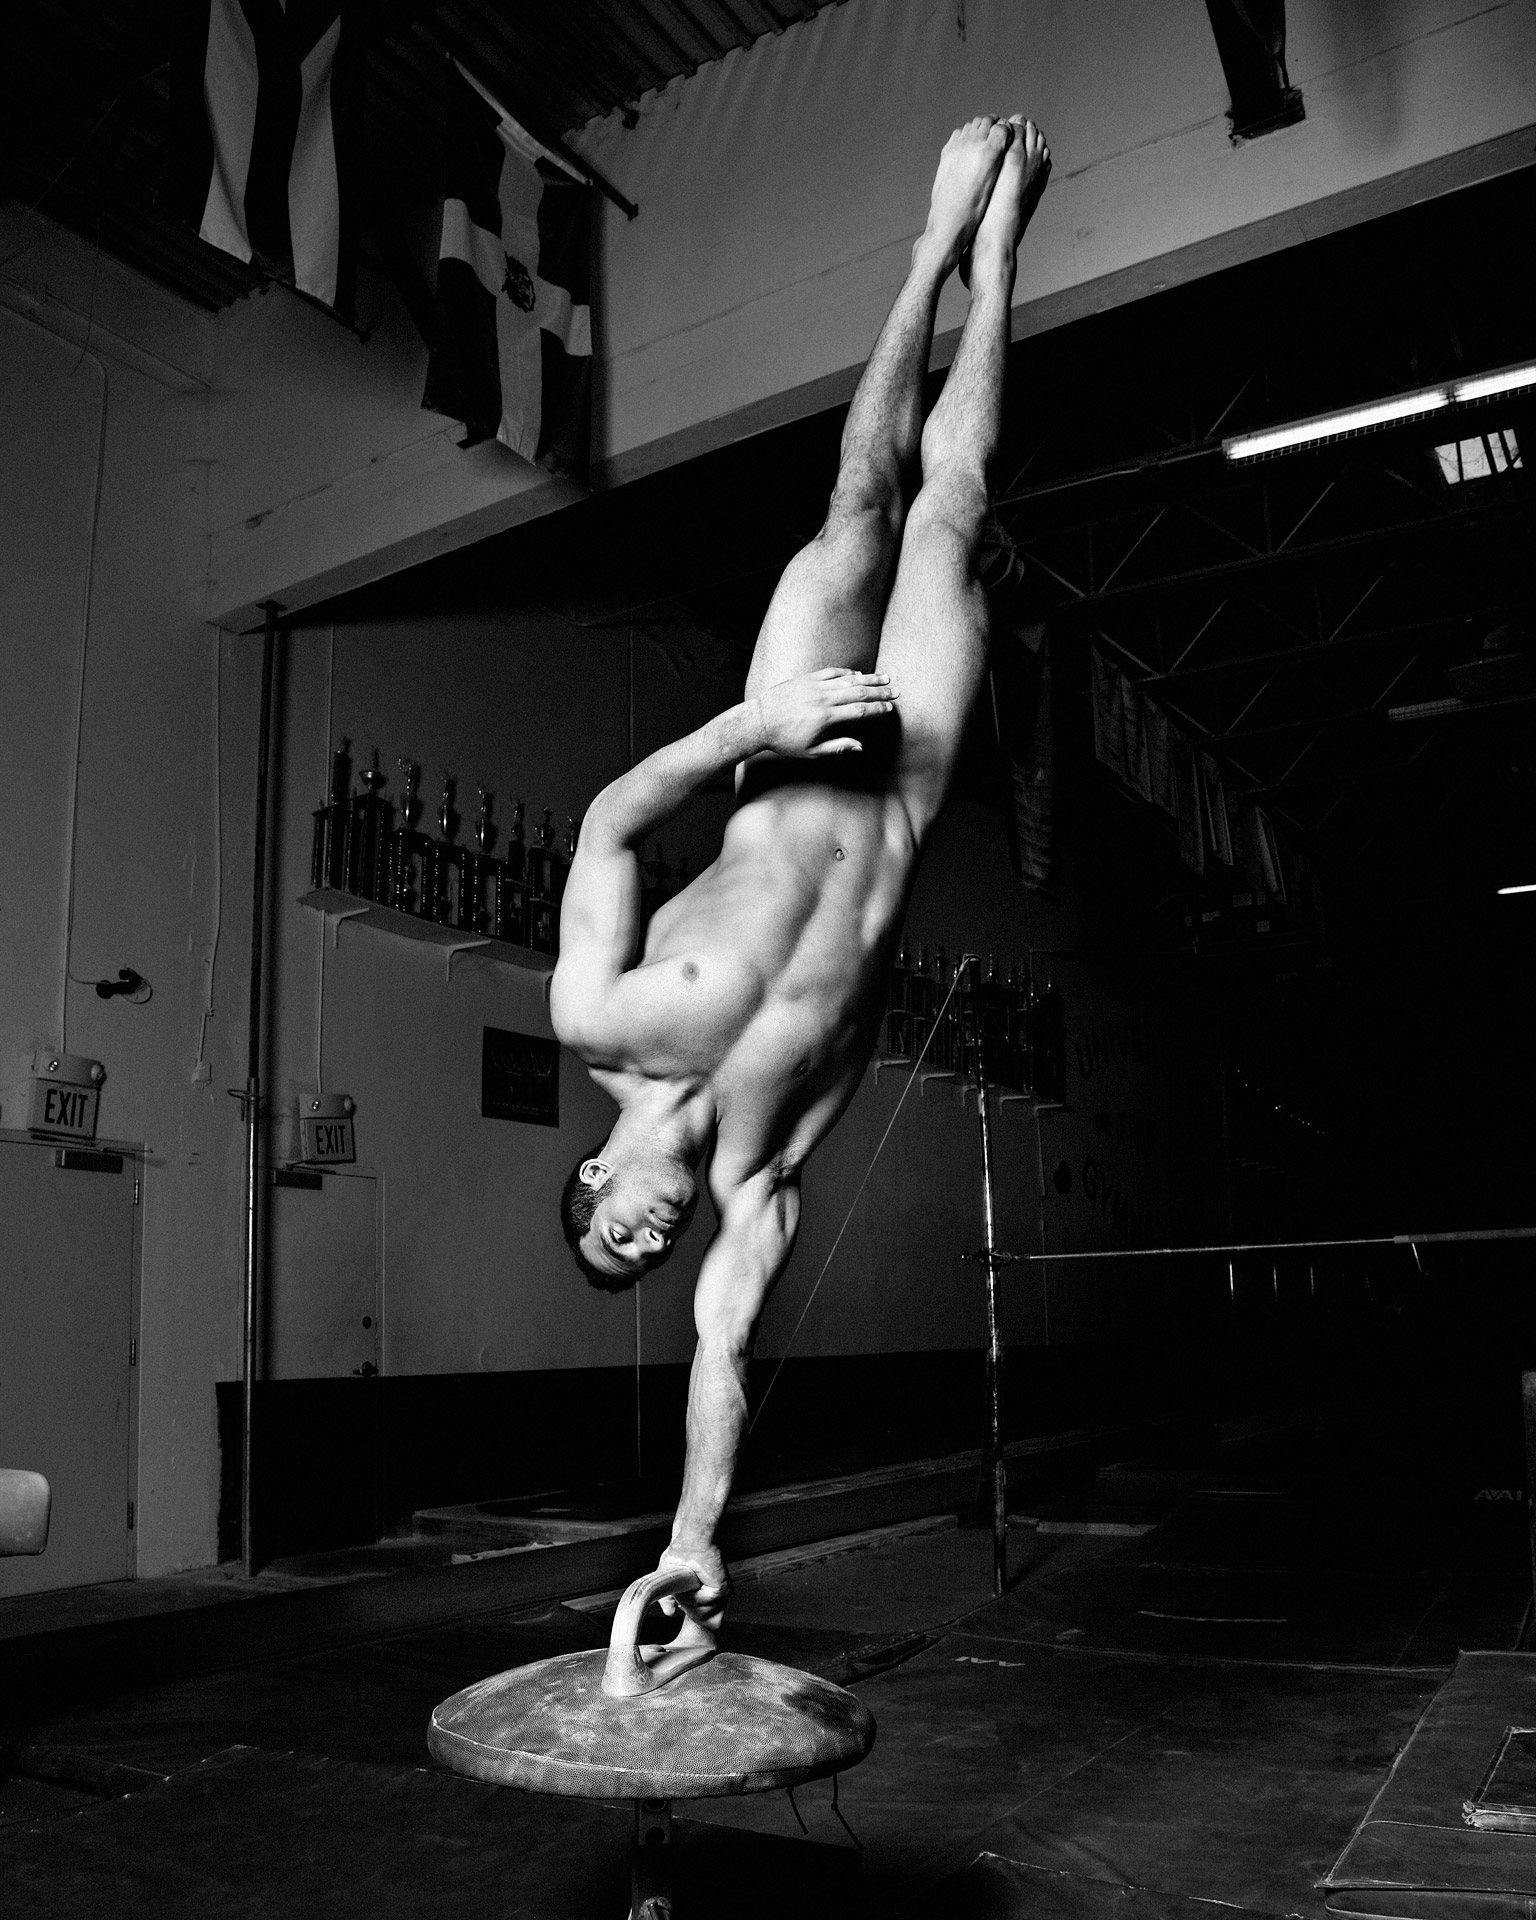 Espn Body Issue 2012 Gallery photo 2